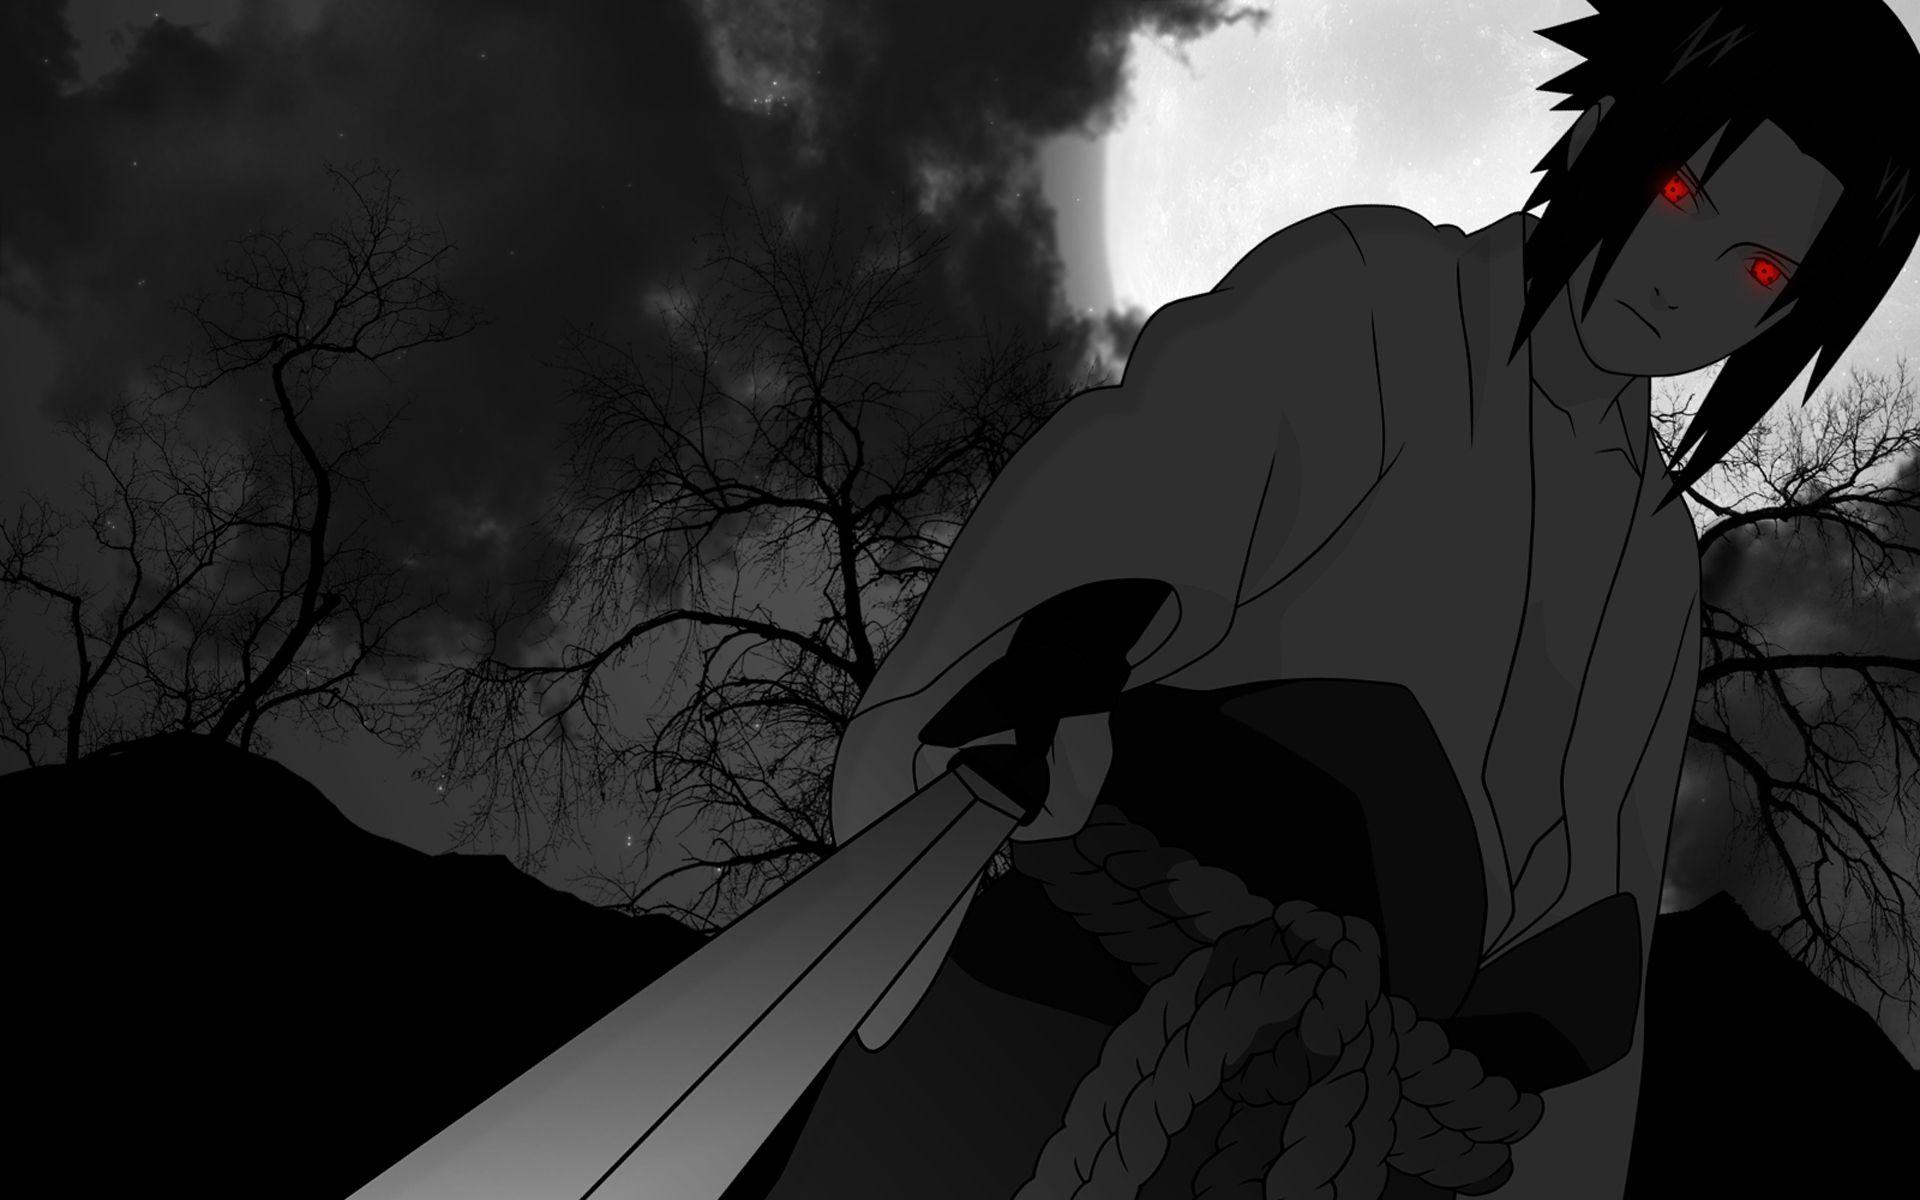 Pics photos wallpaper hd obito uchiha wallpaper hd dark - Uchiha Sasuke Chokuto Sword Full Hd Wallpaper Your Hd Wallpaper Shared Via Slingpic